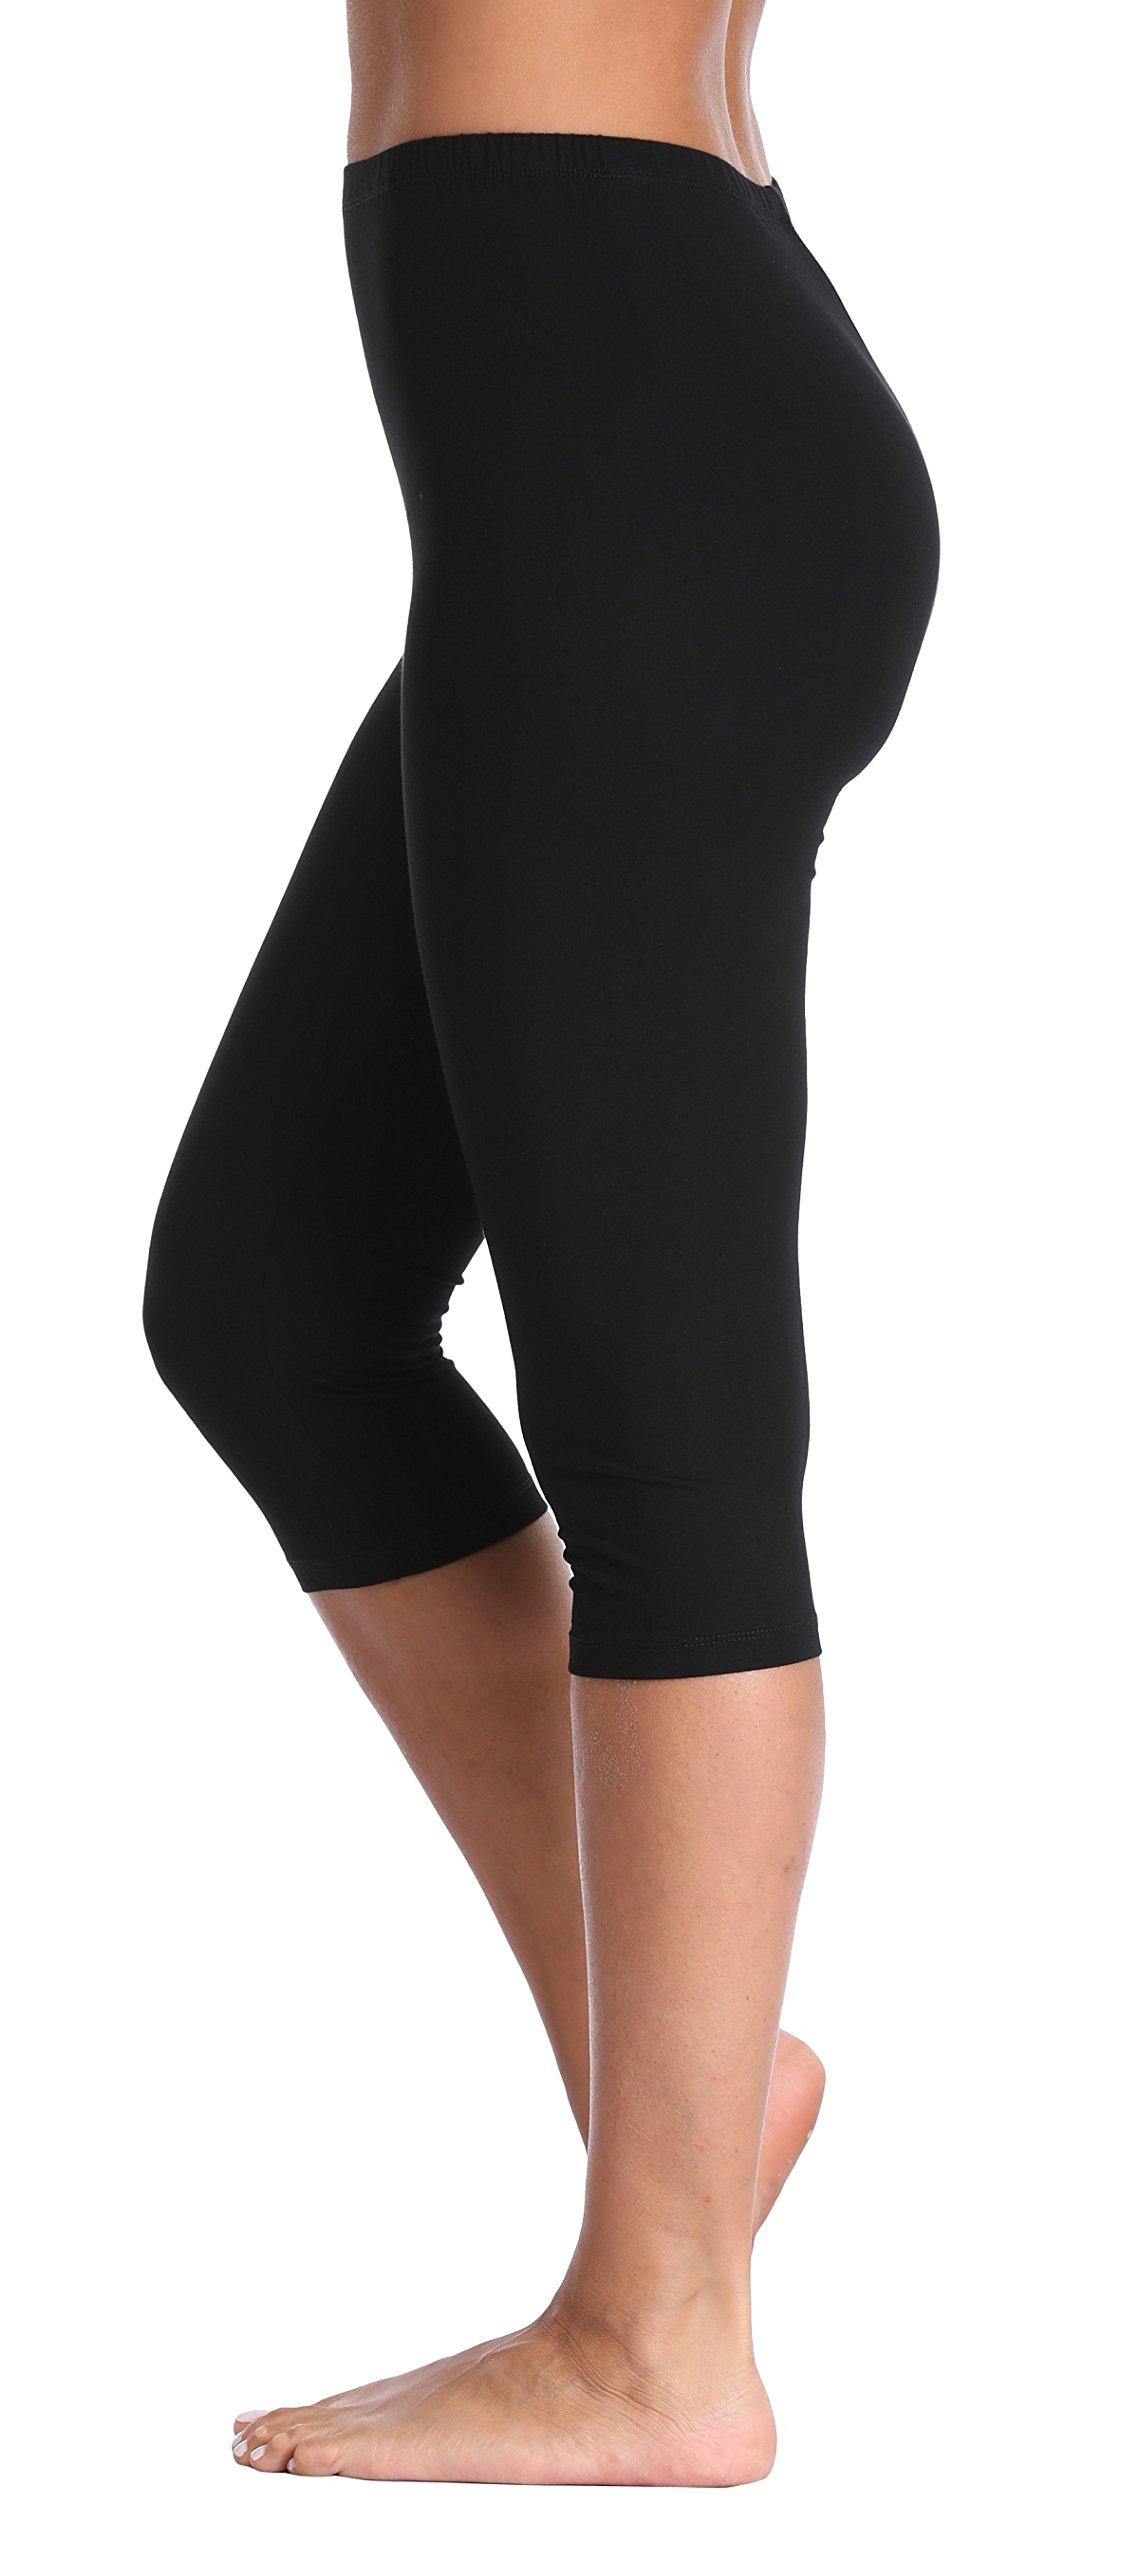 A-Wintage Women's Extra Soft Capri Leggings Modal 3/4 Length Pants High Waist